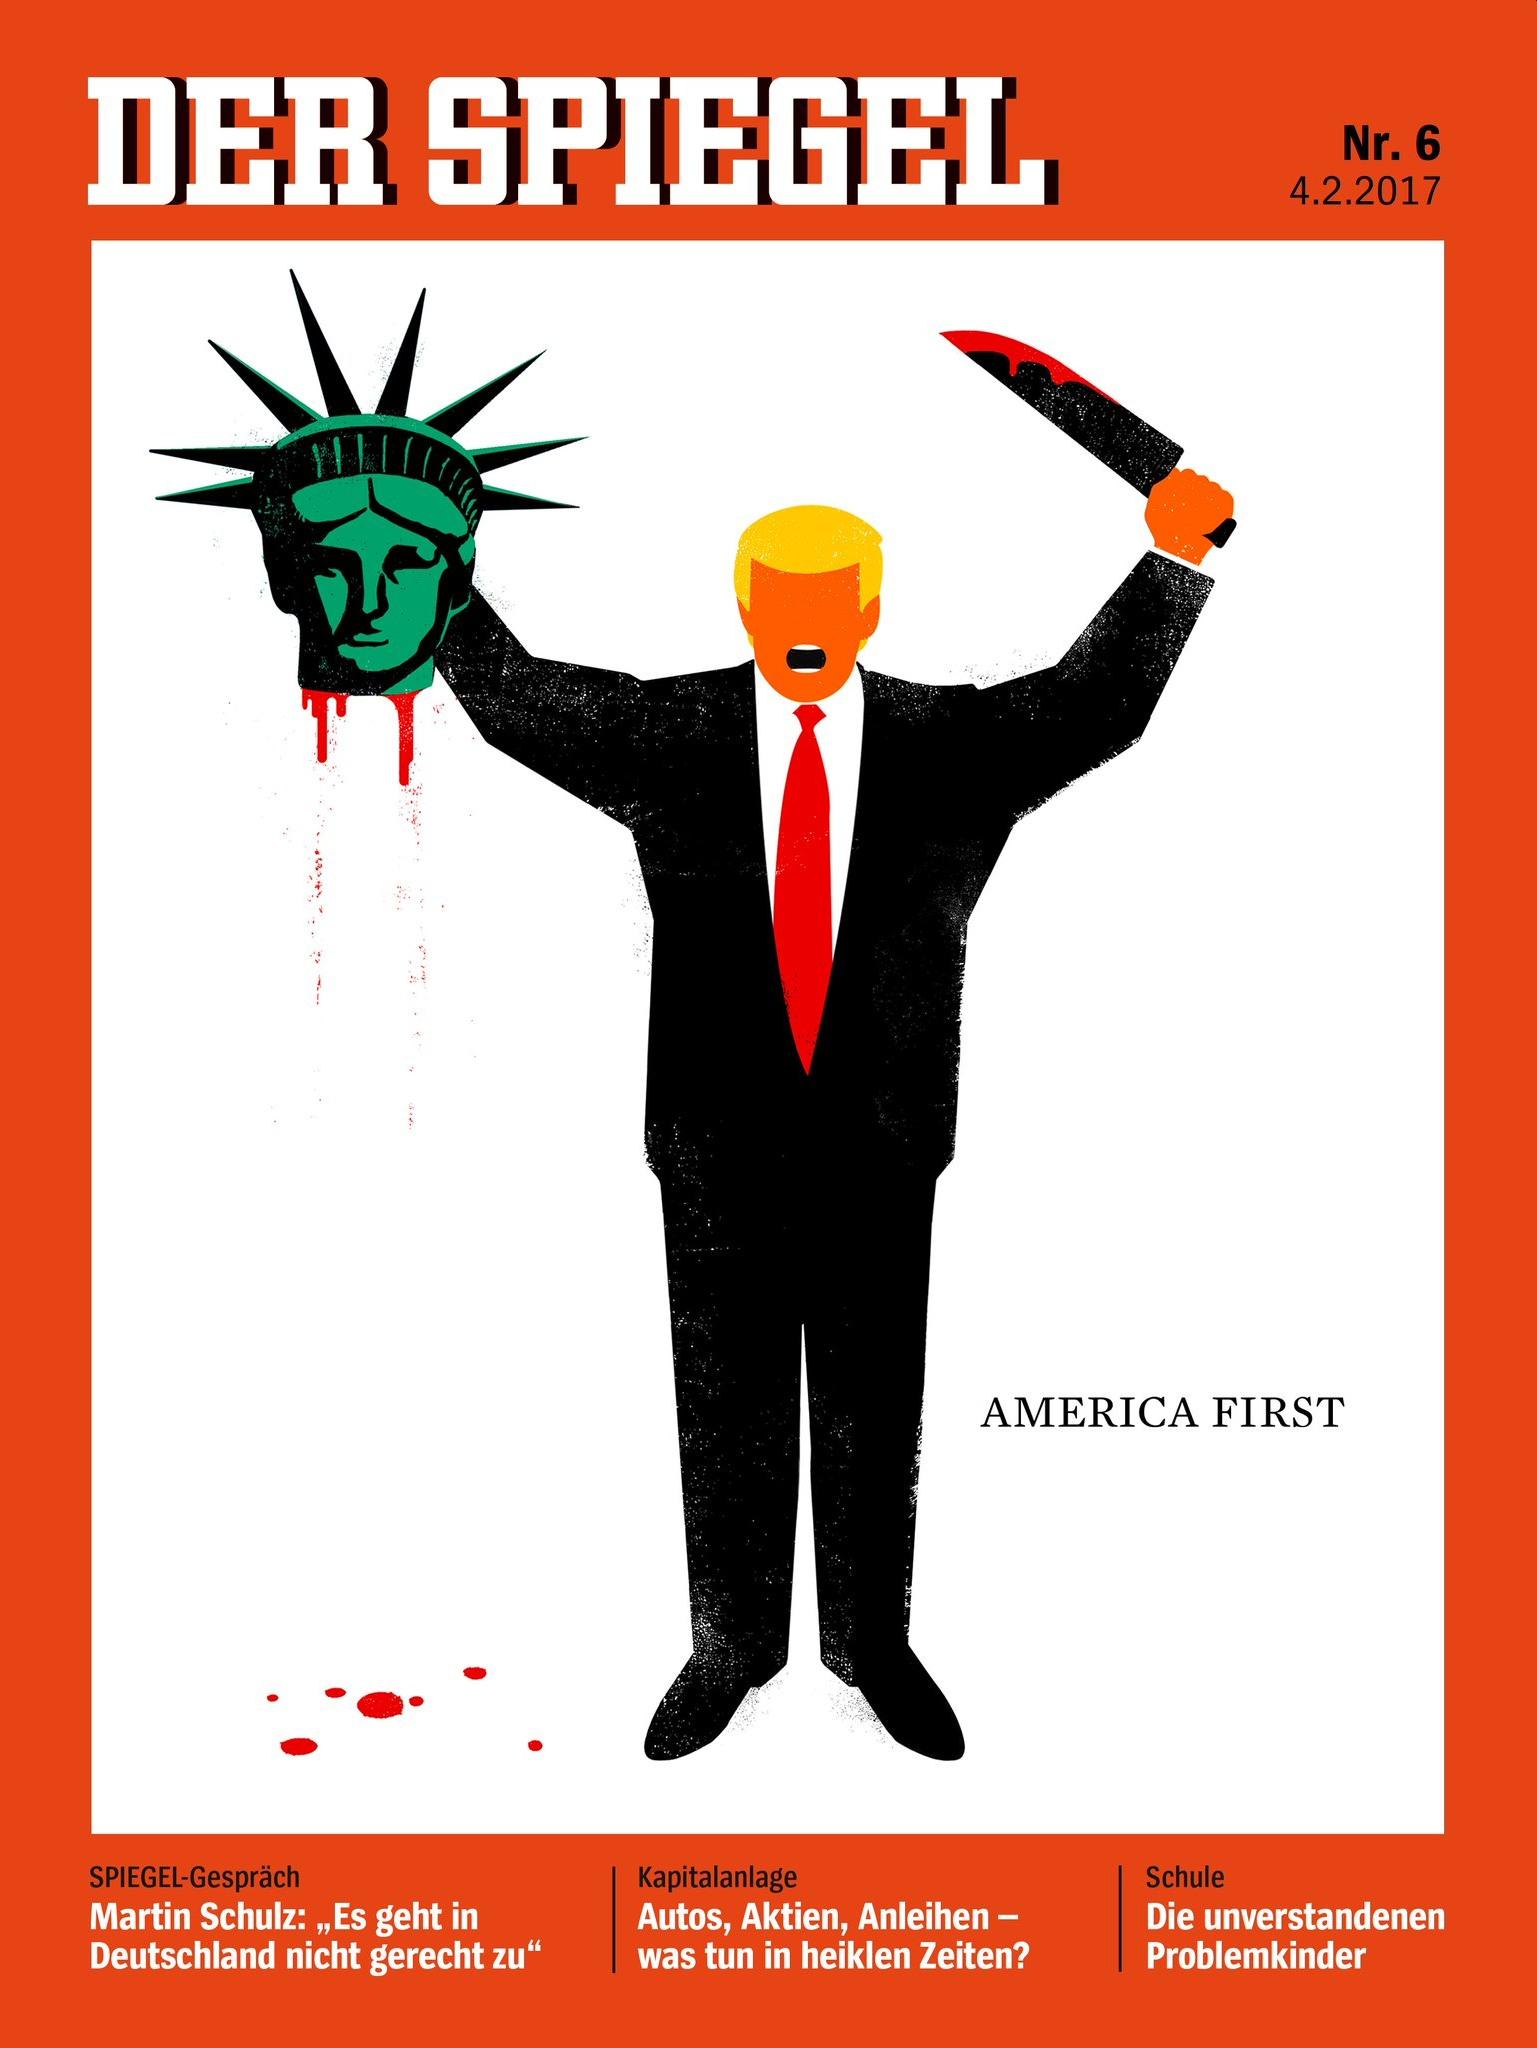 der spiegel  bitchy | Donald Trump tweet-stormed a few decide who quashed the Muslim Ban der spiegel